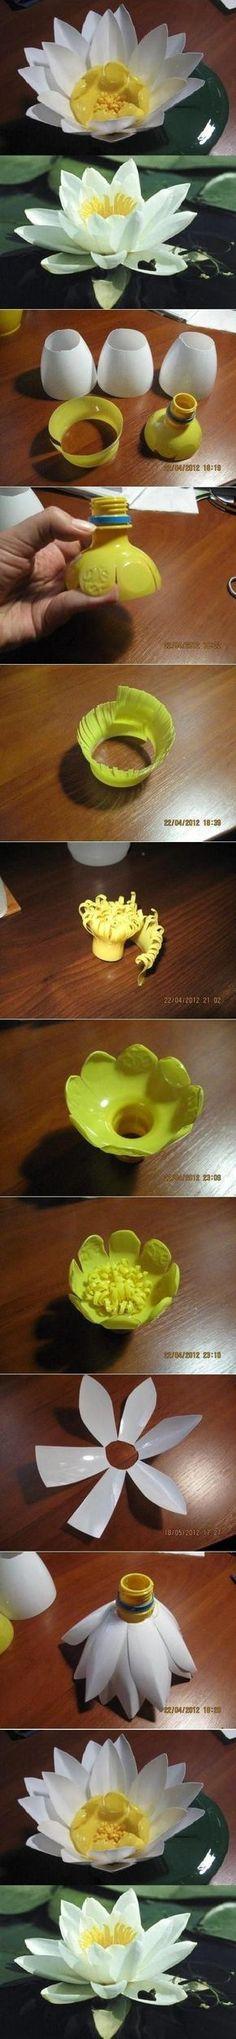 DIY Plastic Bottle Lily Flower